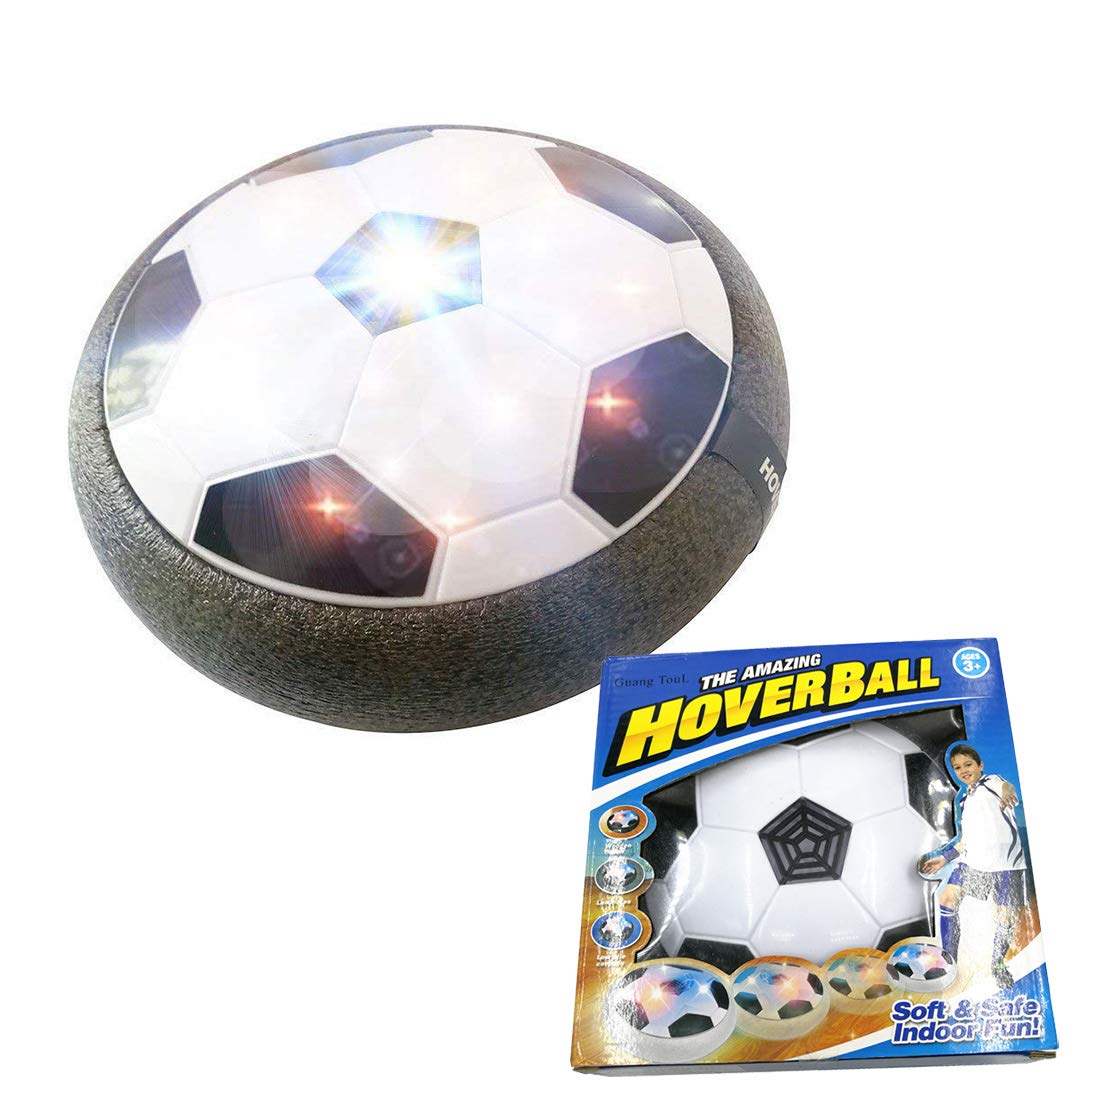 Air電源Hoverボール、子供おもちゃ、休日ギフト、空圧Suspended Football with Foamバンパー、LEDライトfor Boys Girls Sport子供おもちゃトレーニングFootball andインドアアウトドアまたはチームゲーム B078PHLN31